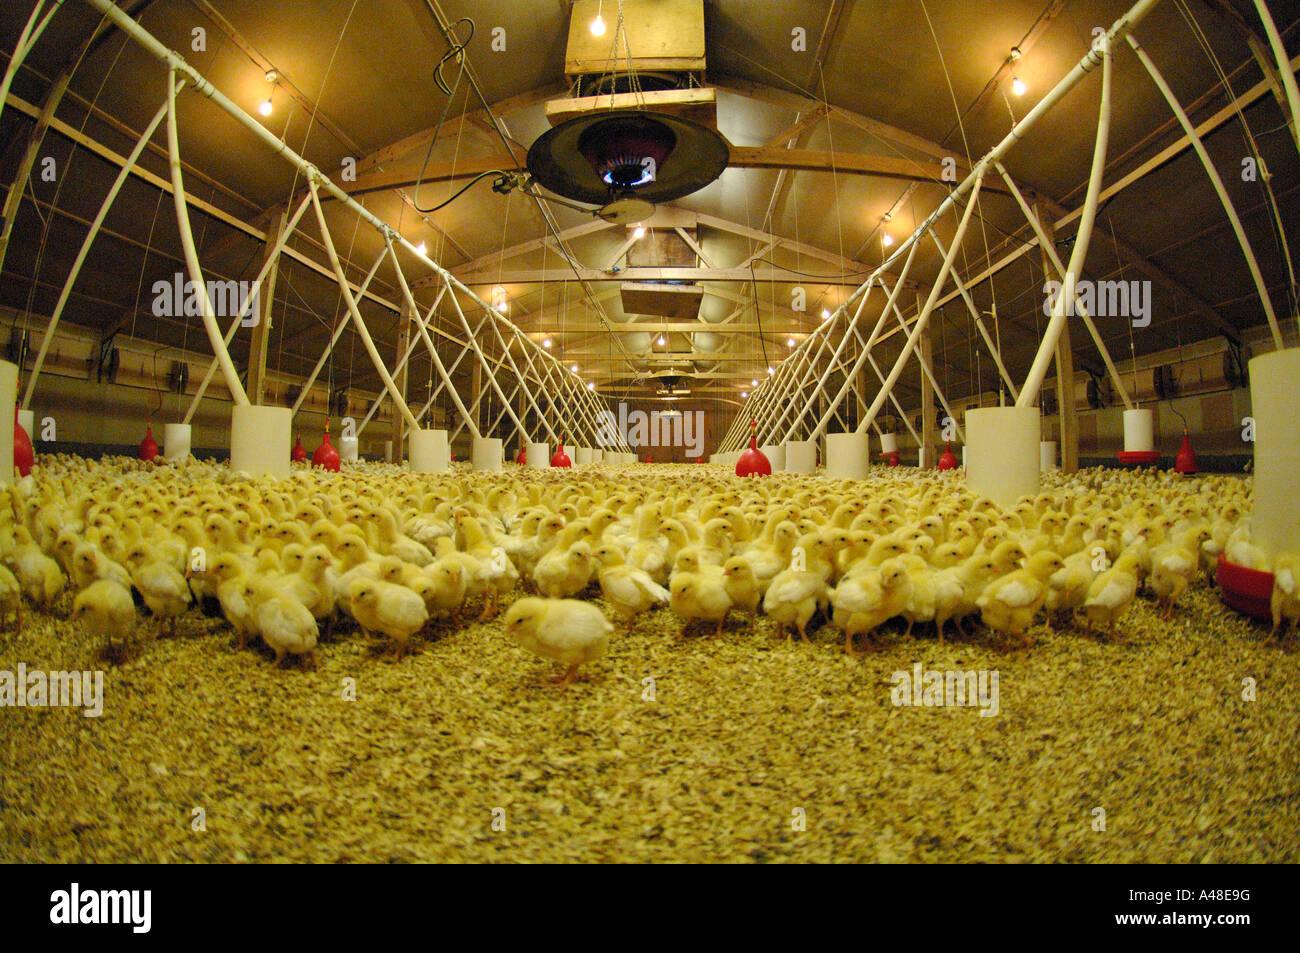 Vier Tage alten Küken Bio Geflügel Farm UK Europe Stockfotografie - Alamy